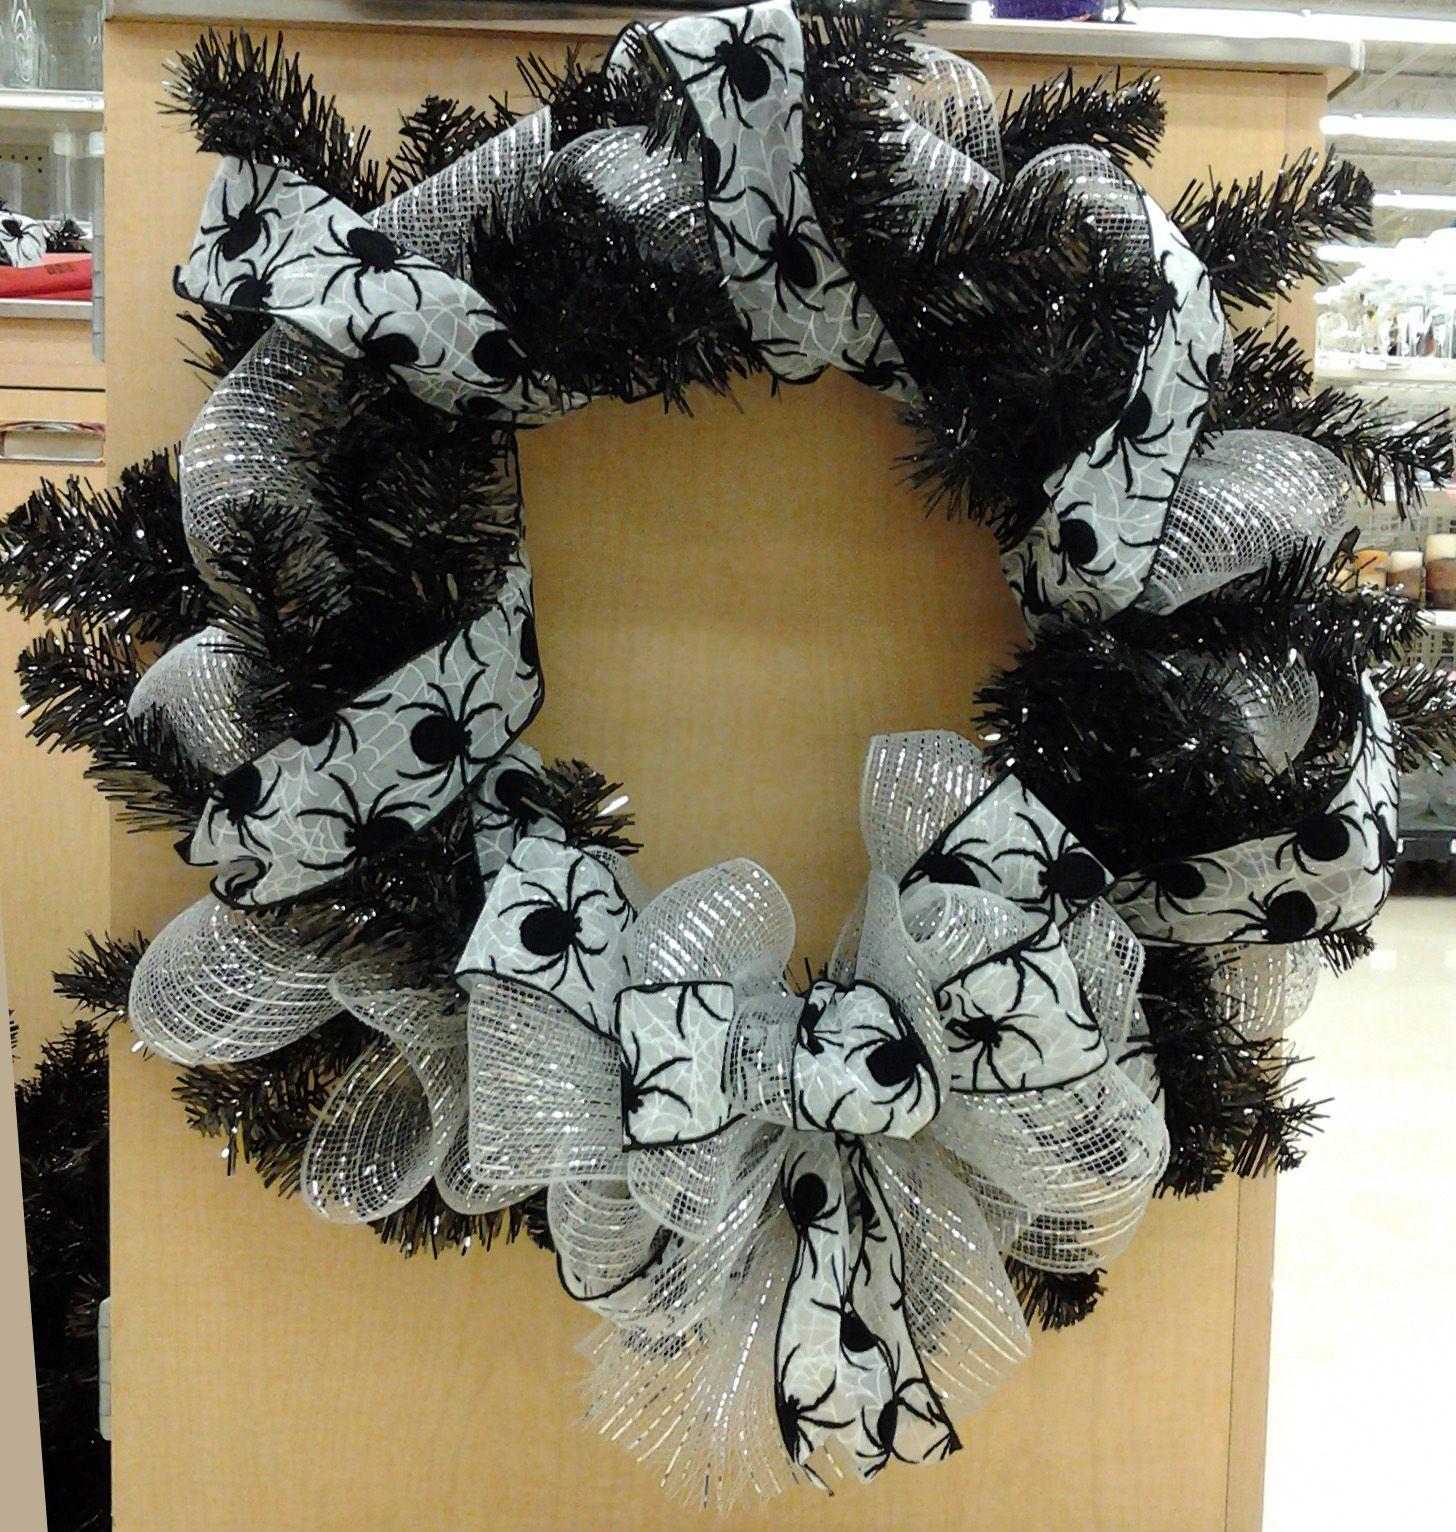 Black Flower And Crow Halloween Wreath: Floral Design, Black & White Halloween Tincel Wreath With